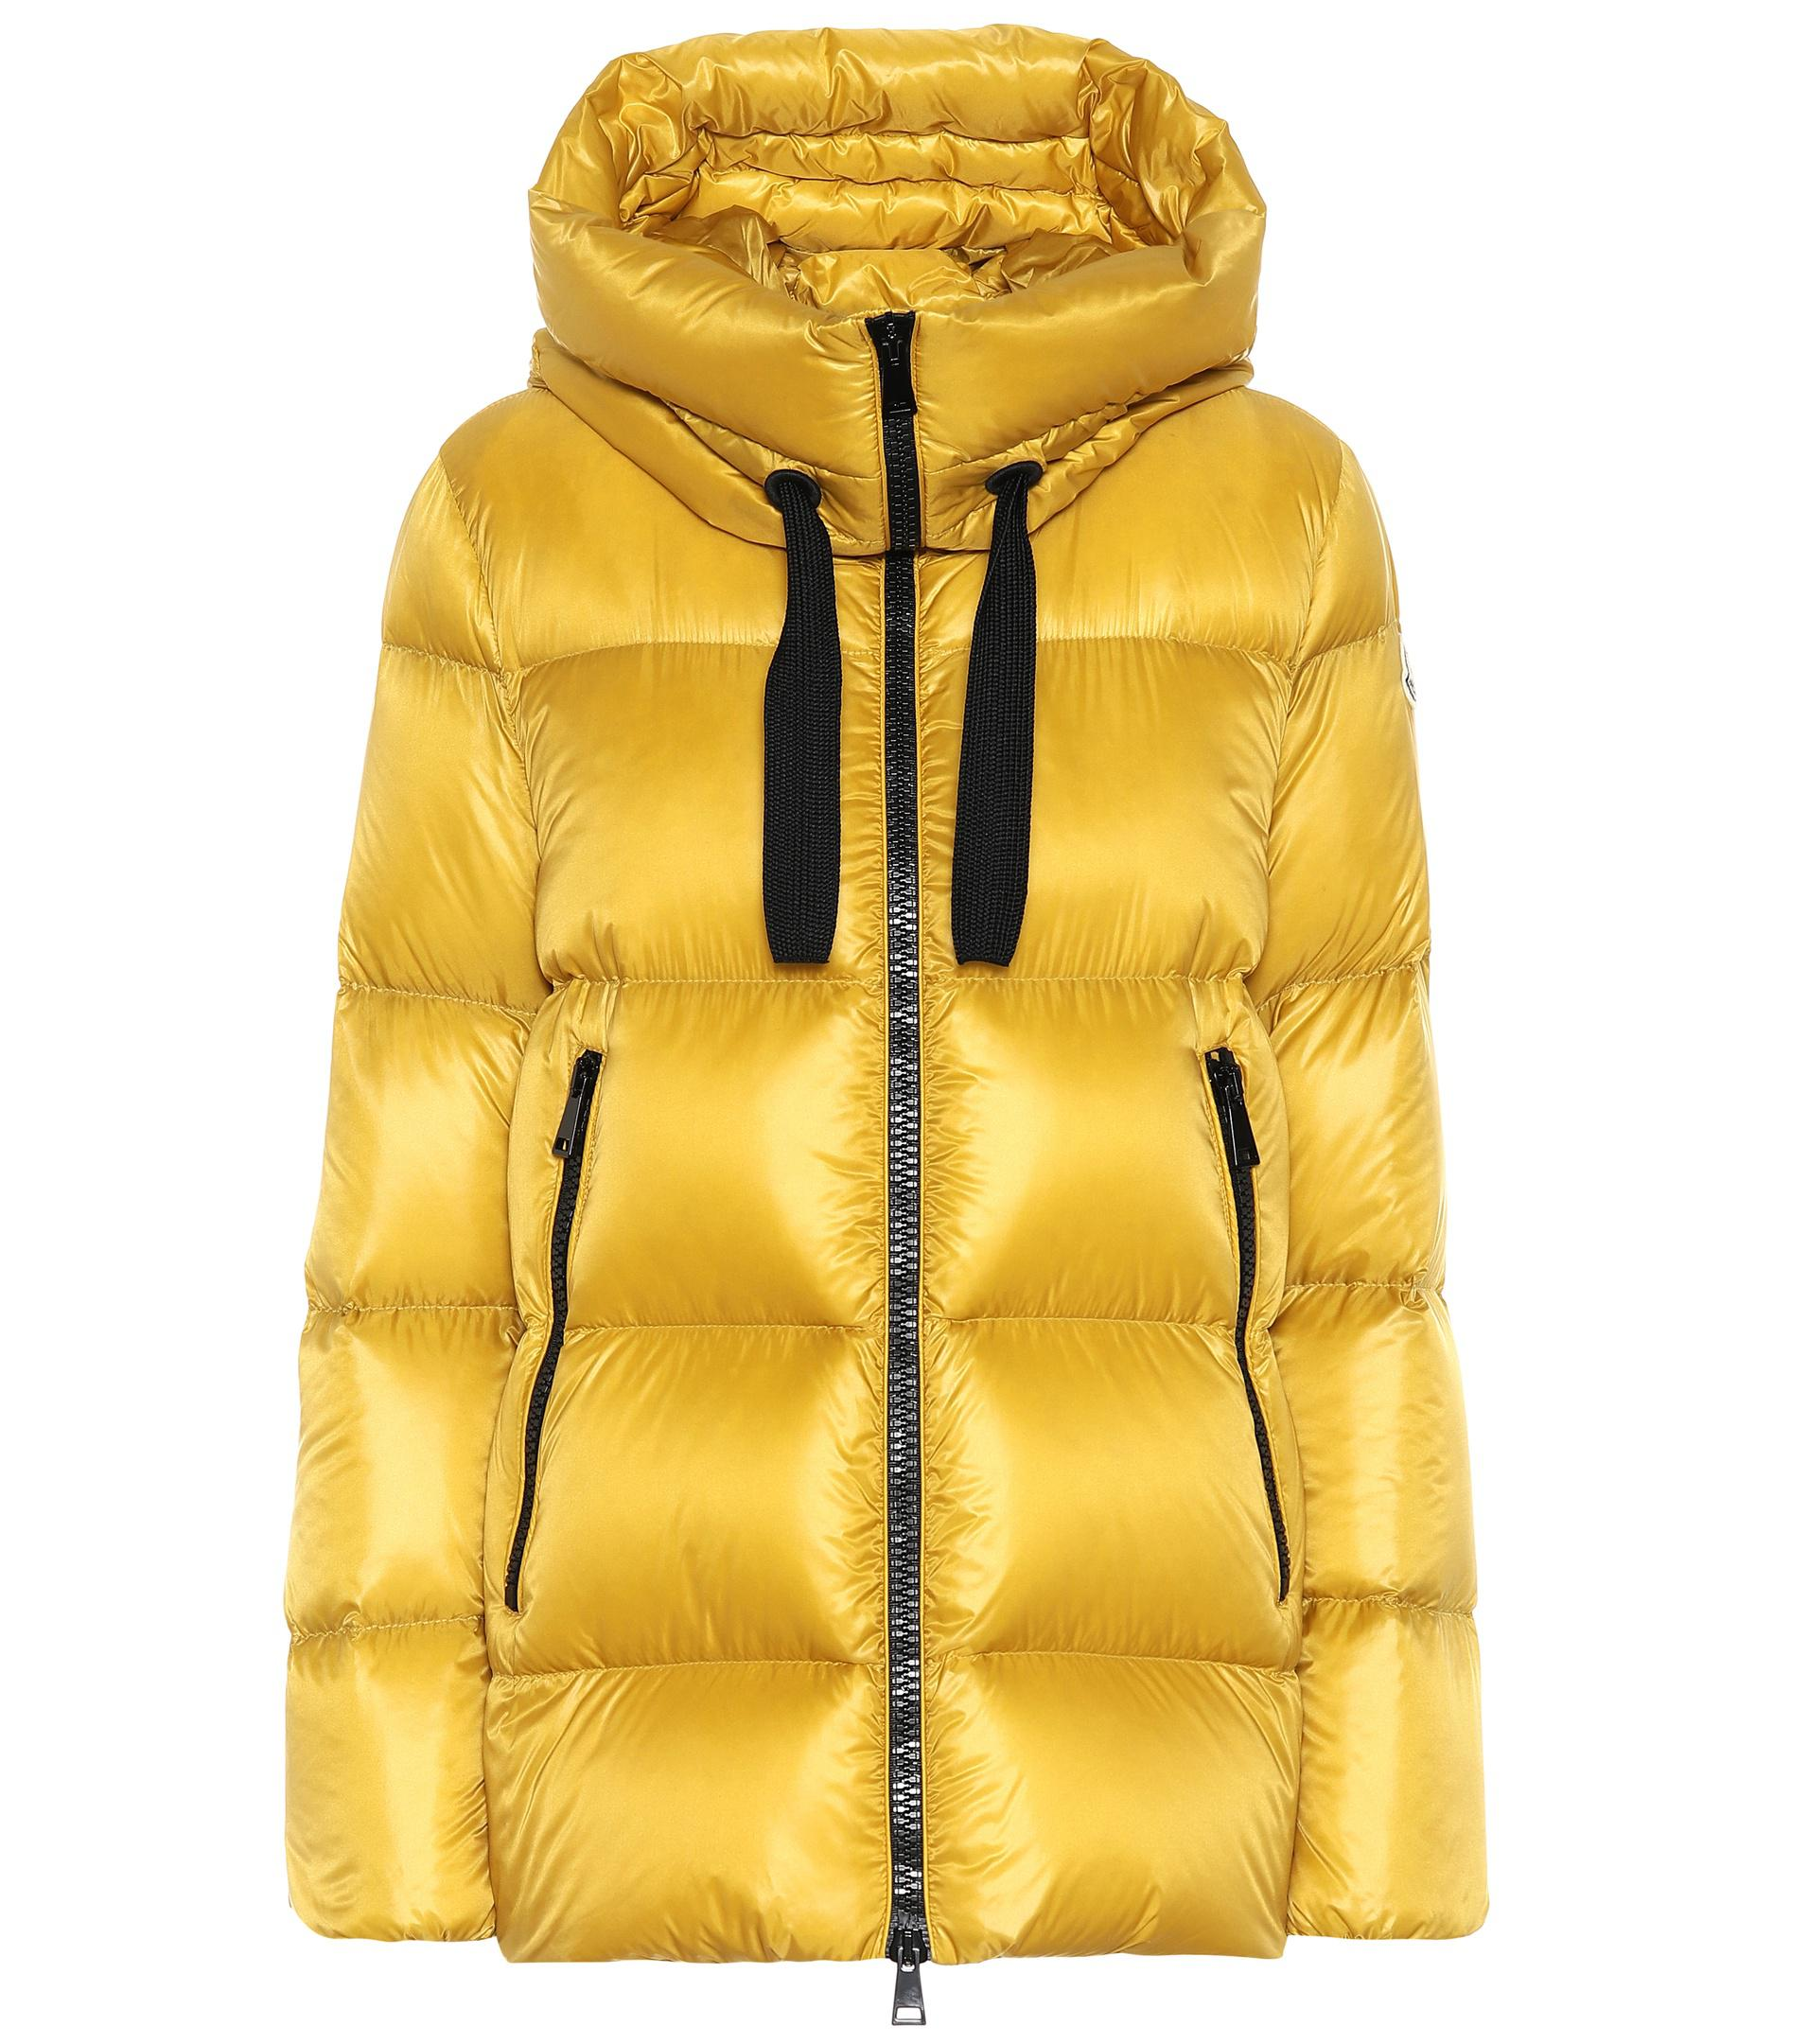 50279ddd5 good moncler vest yellow ice afbf8 e4cf8